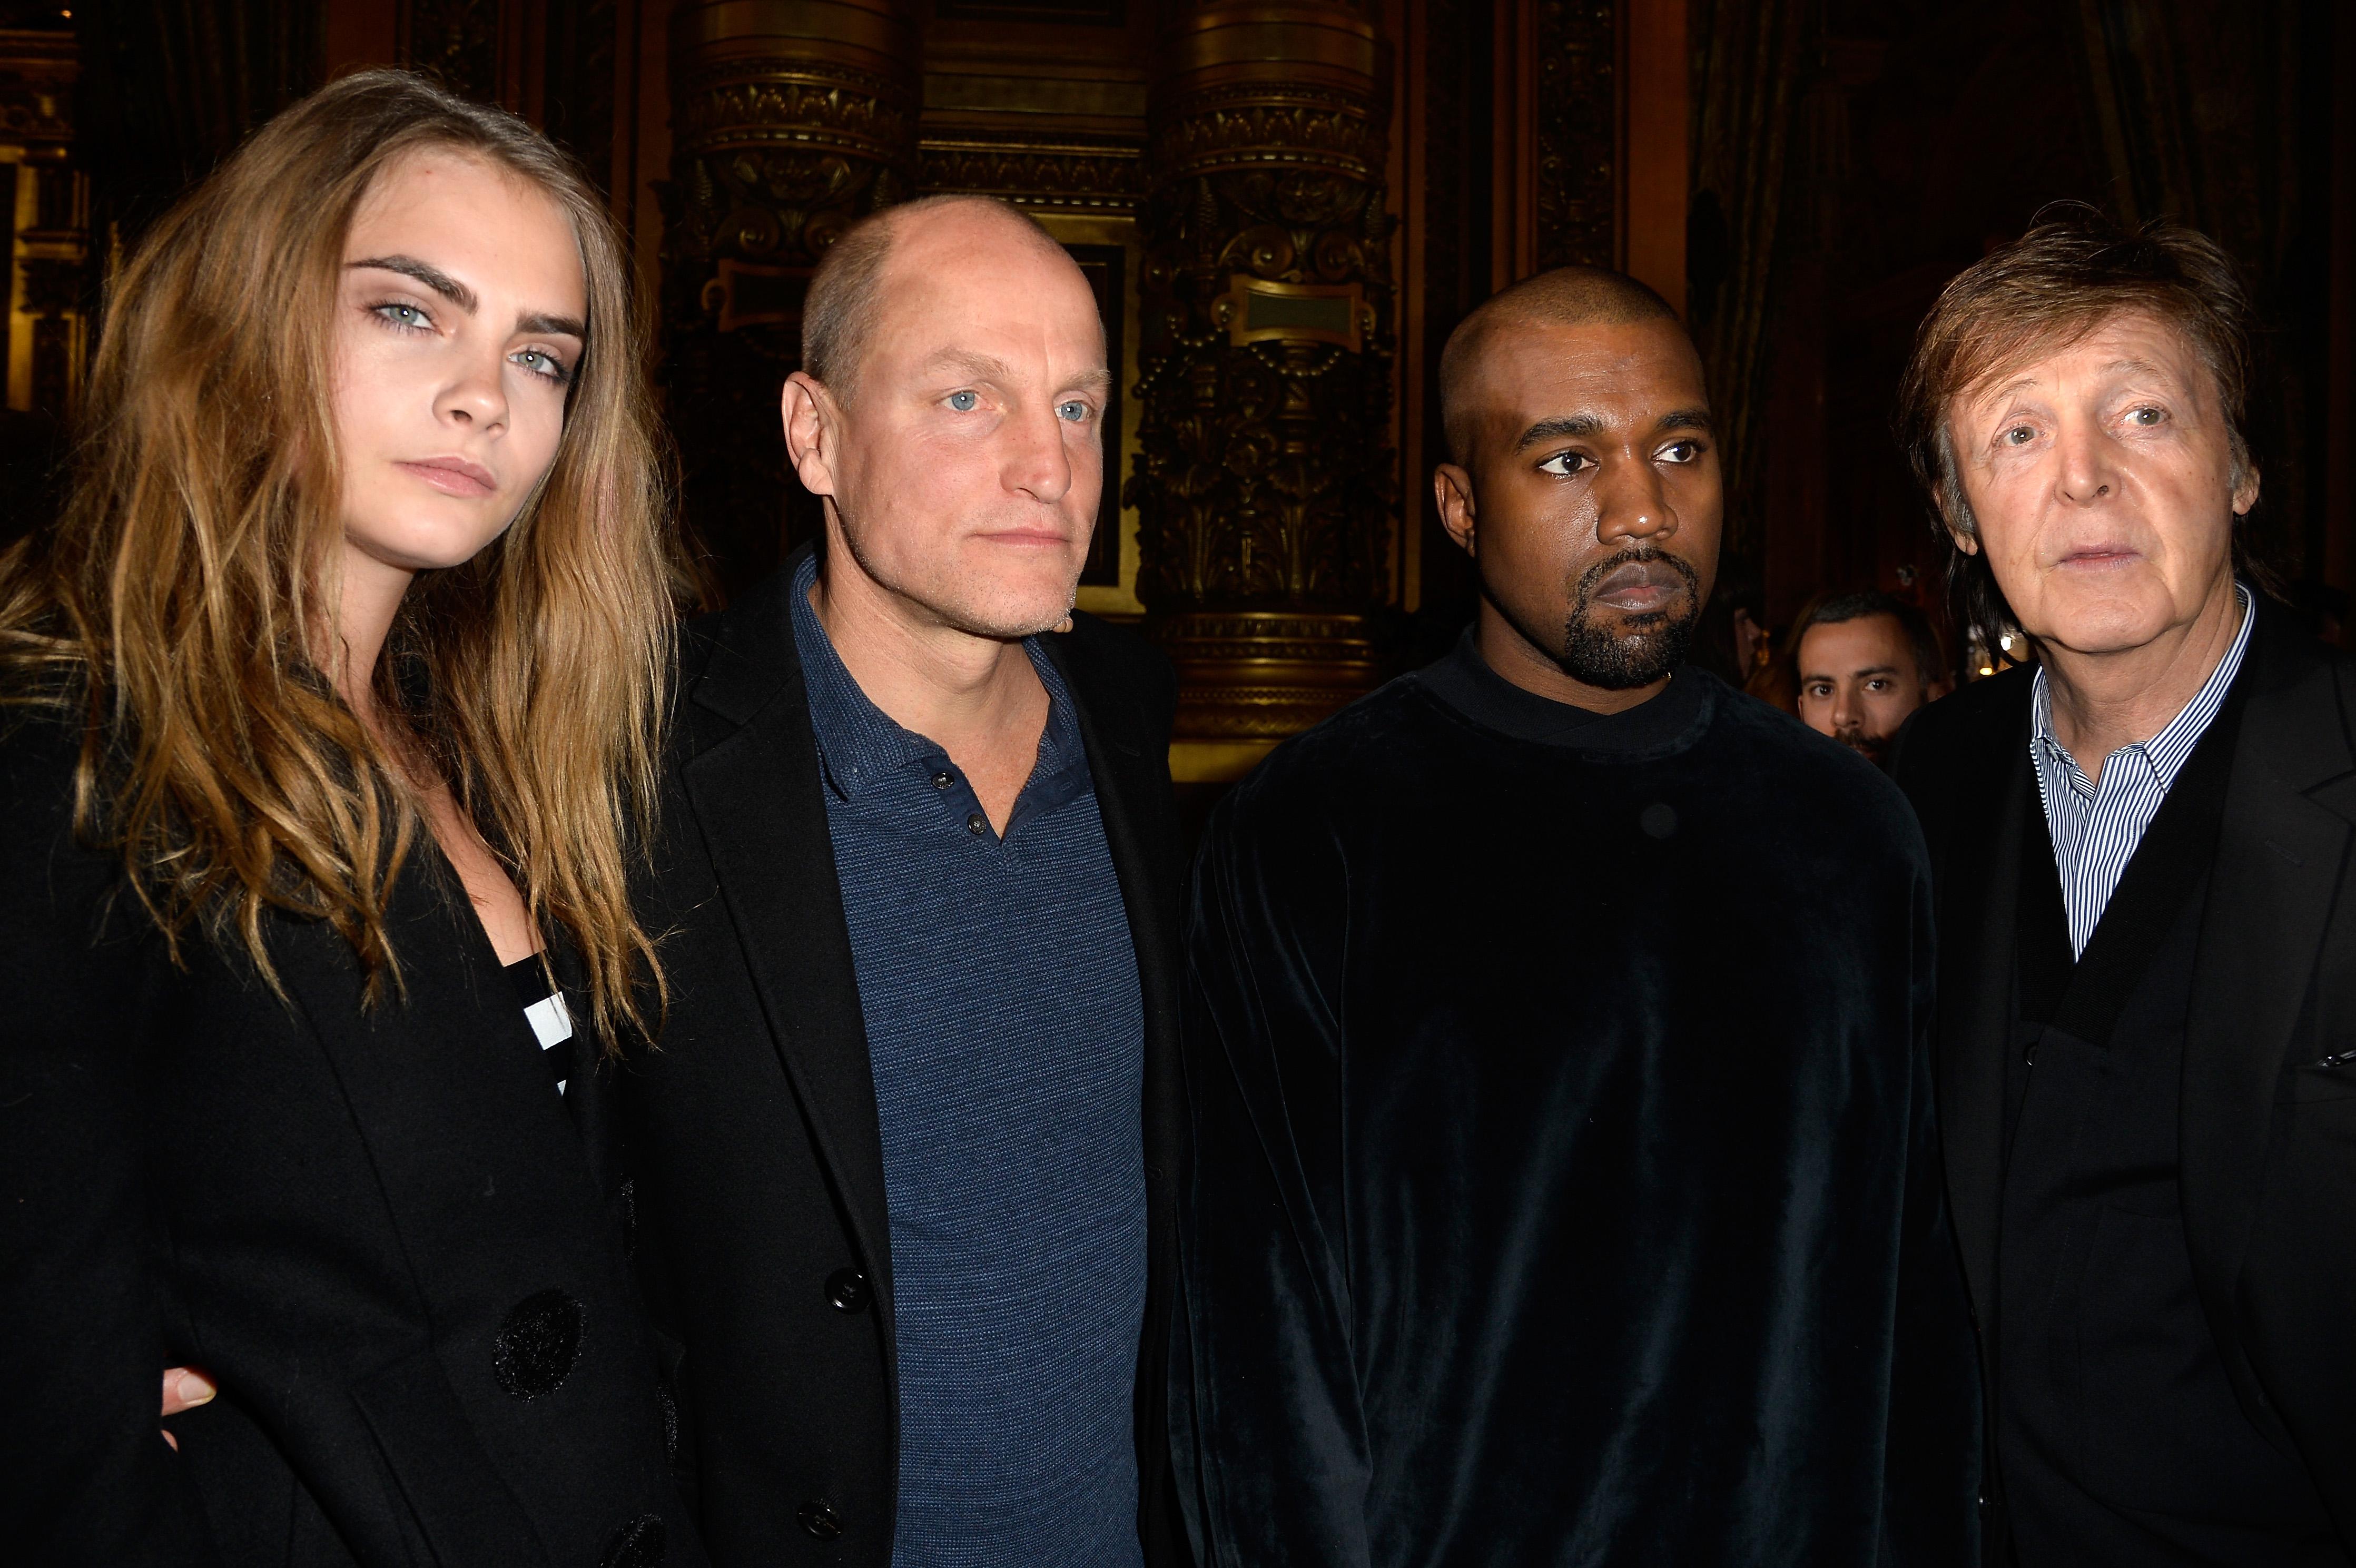 Cara Delevingne, Woody Harrelson, Kanye West and Paul McCartney at the Stella McCartney Fall/Winter 2015 fashion show.